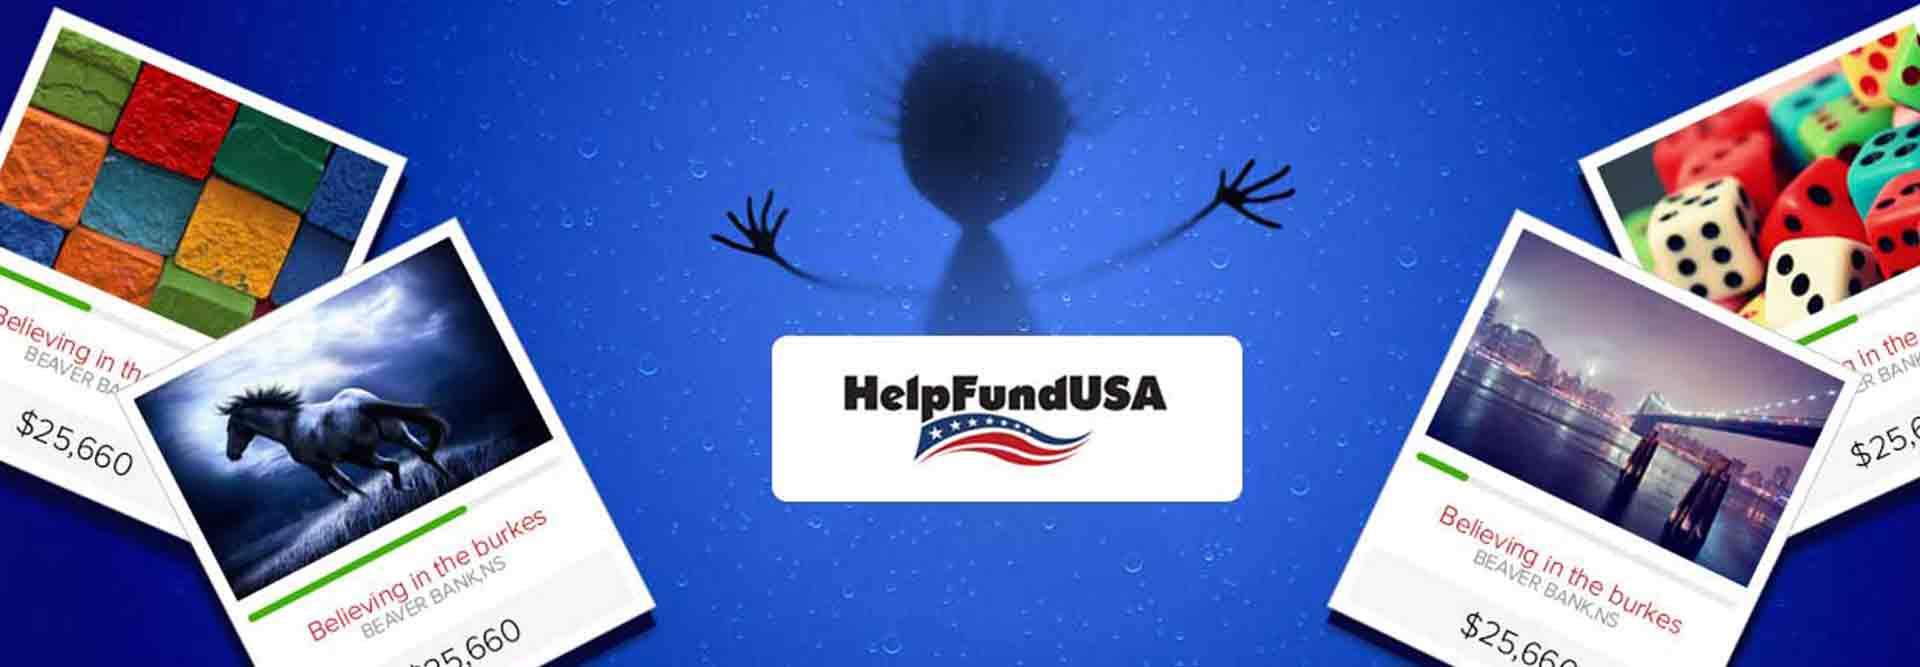 HelpFundUSA-ban